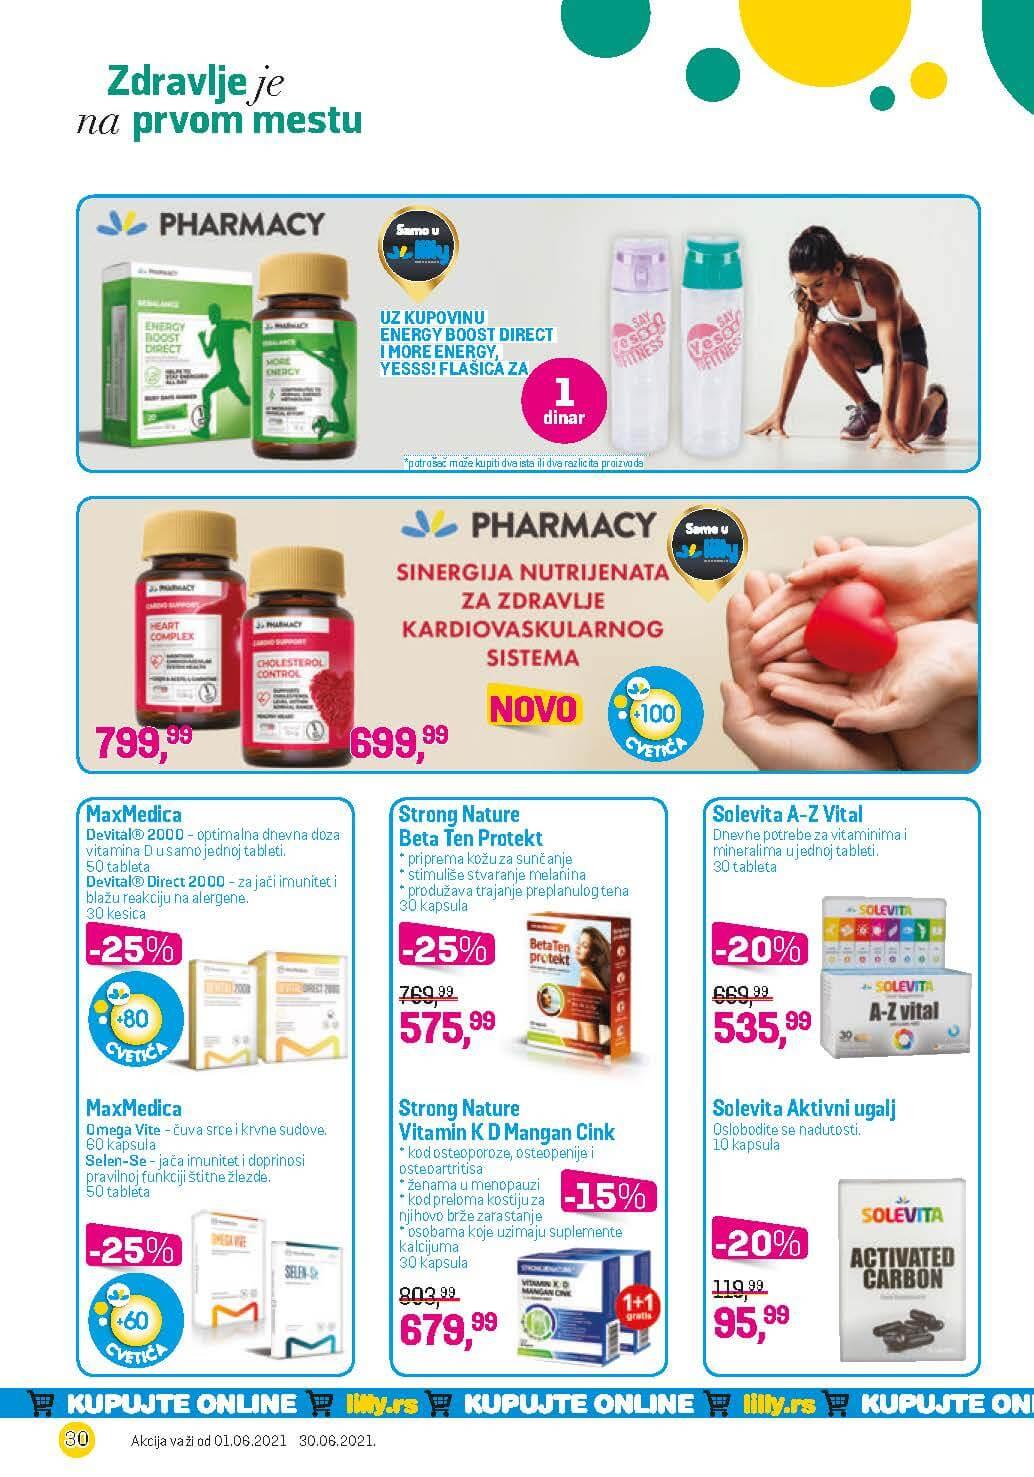 LILLY Katalog LILLY ONLINE Akcija JUN 2021 01.06.2021. 30.06.2021. eKatalozi.com PR Page 30